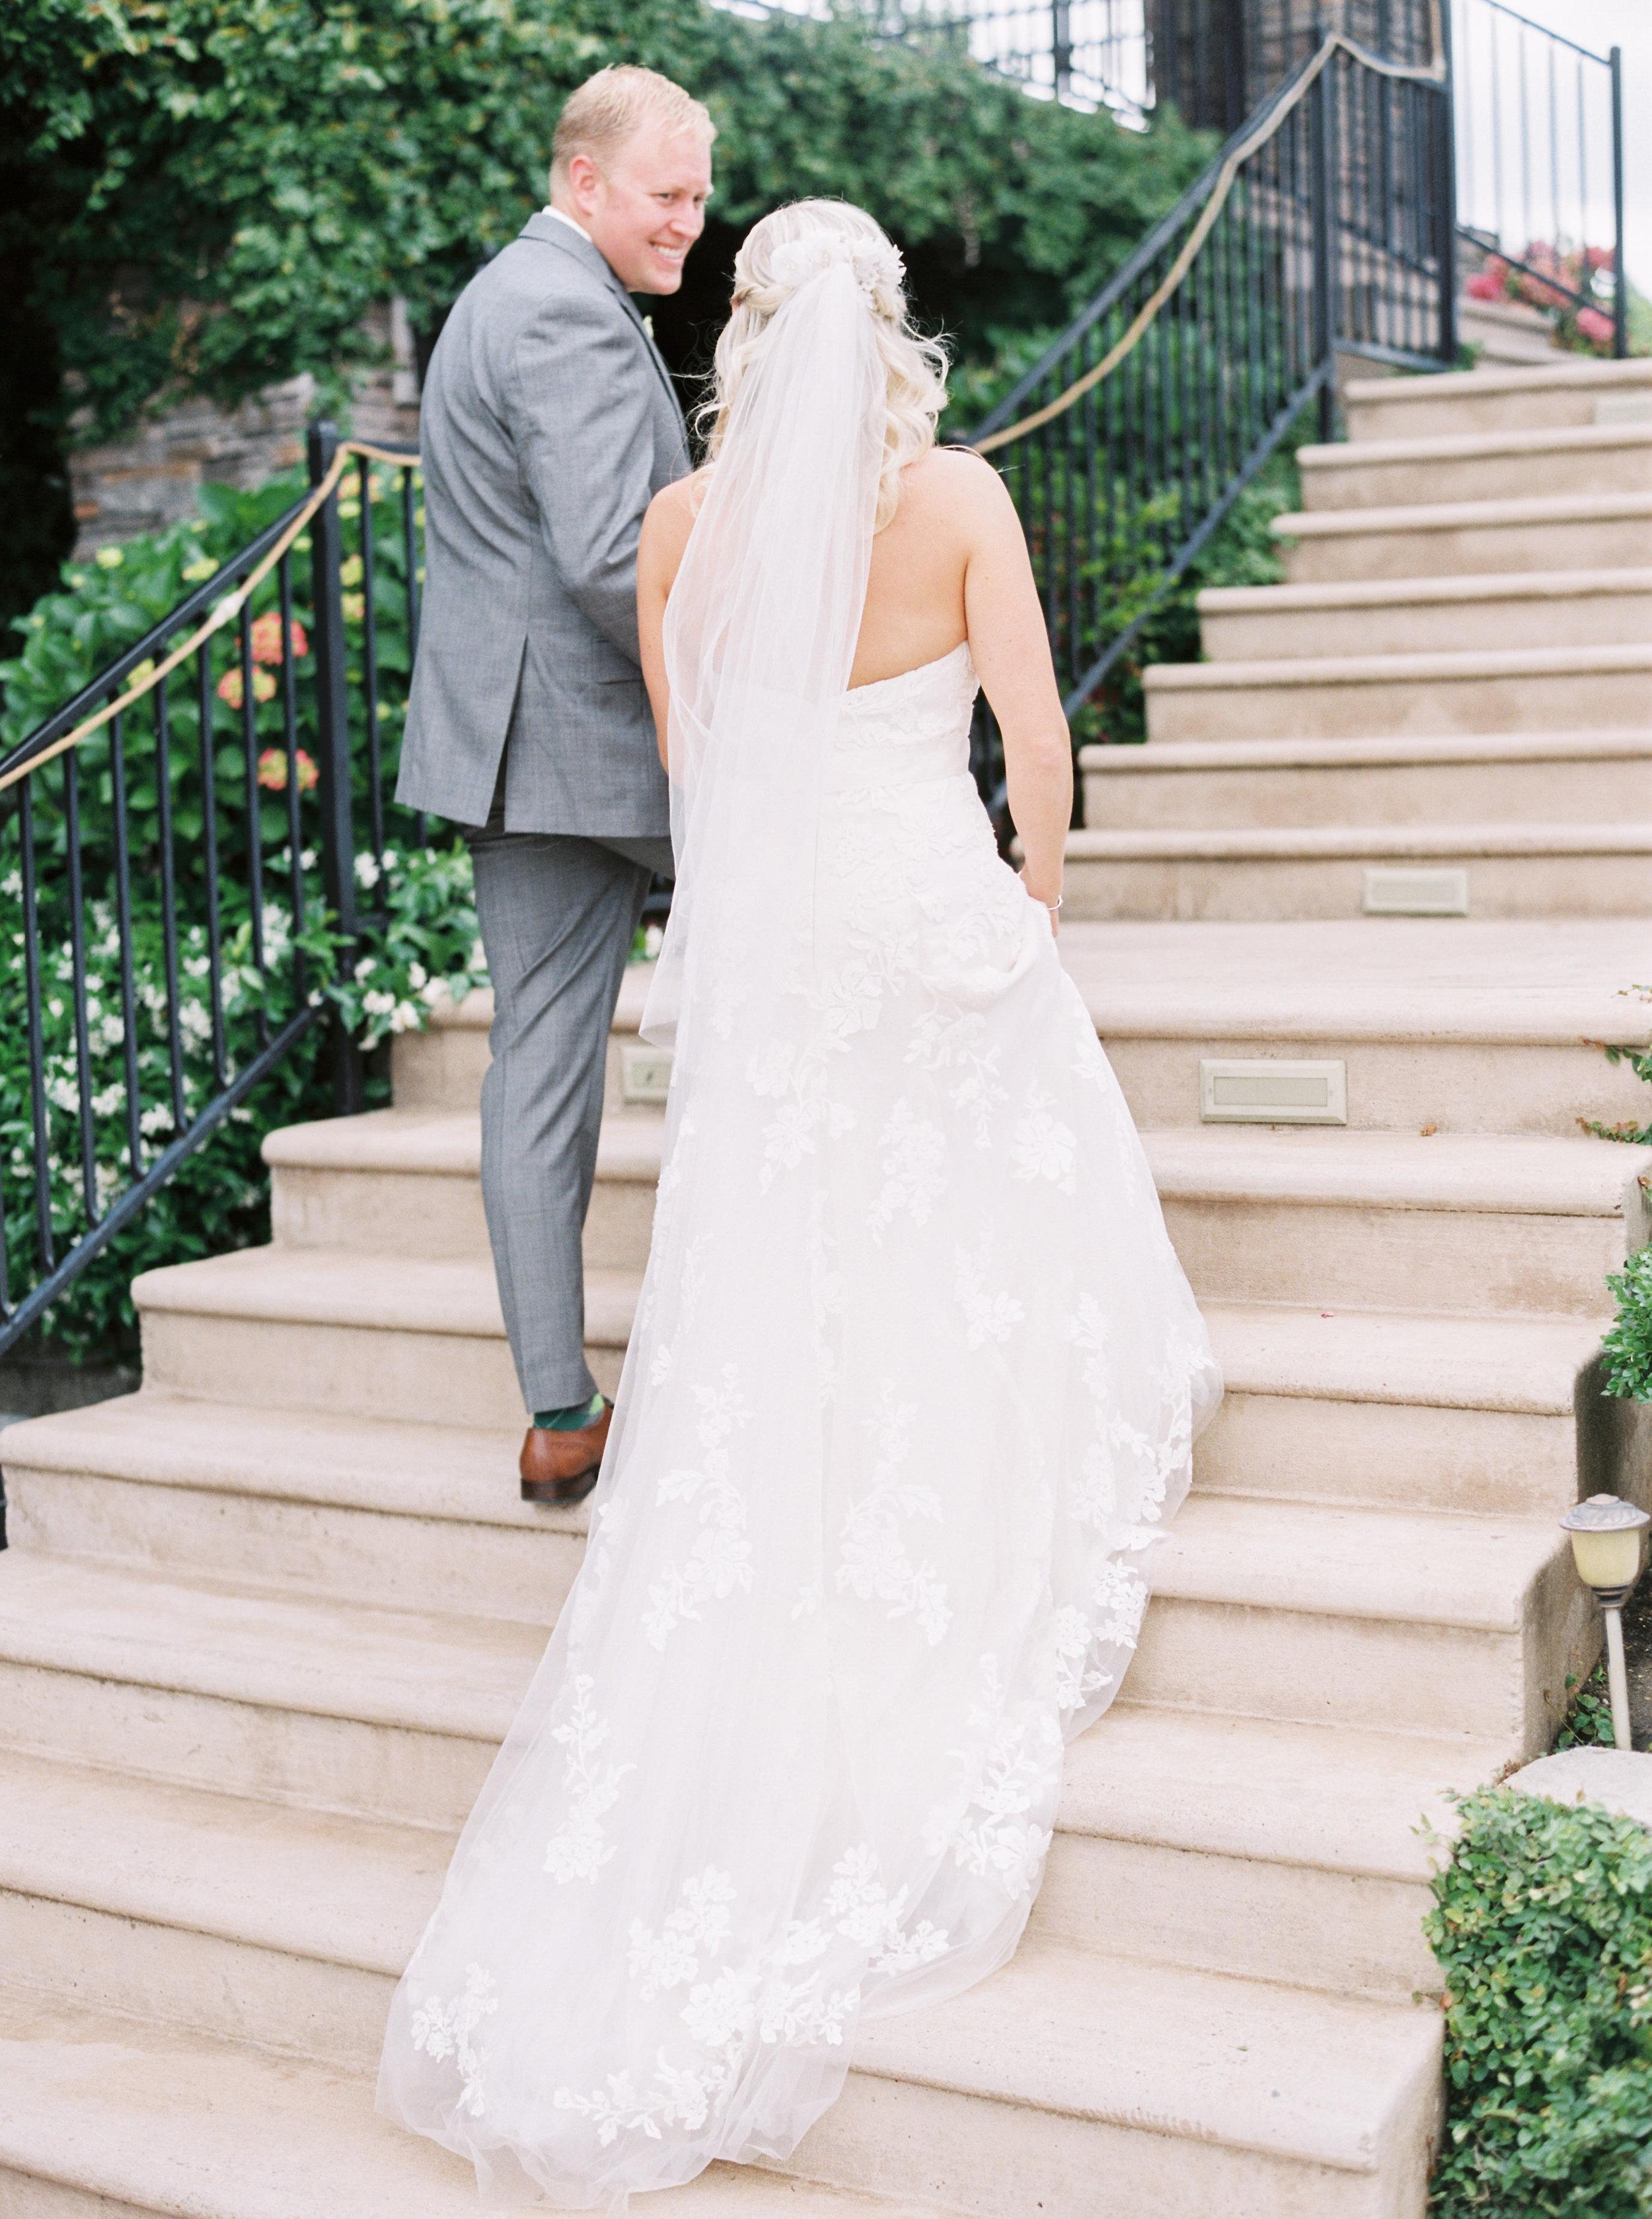 wolfe-heights-event-center-wedding-sacramento-california-wedding-66.jpg